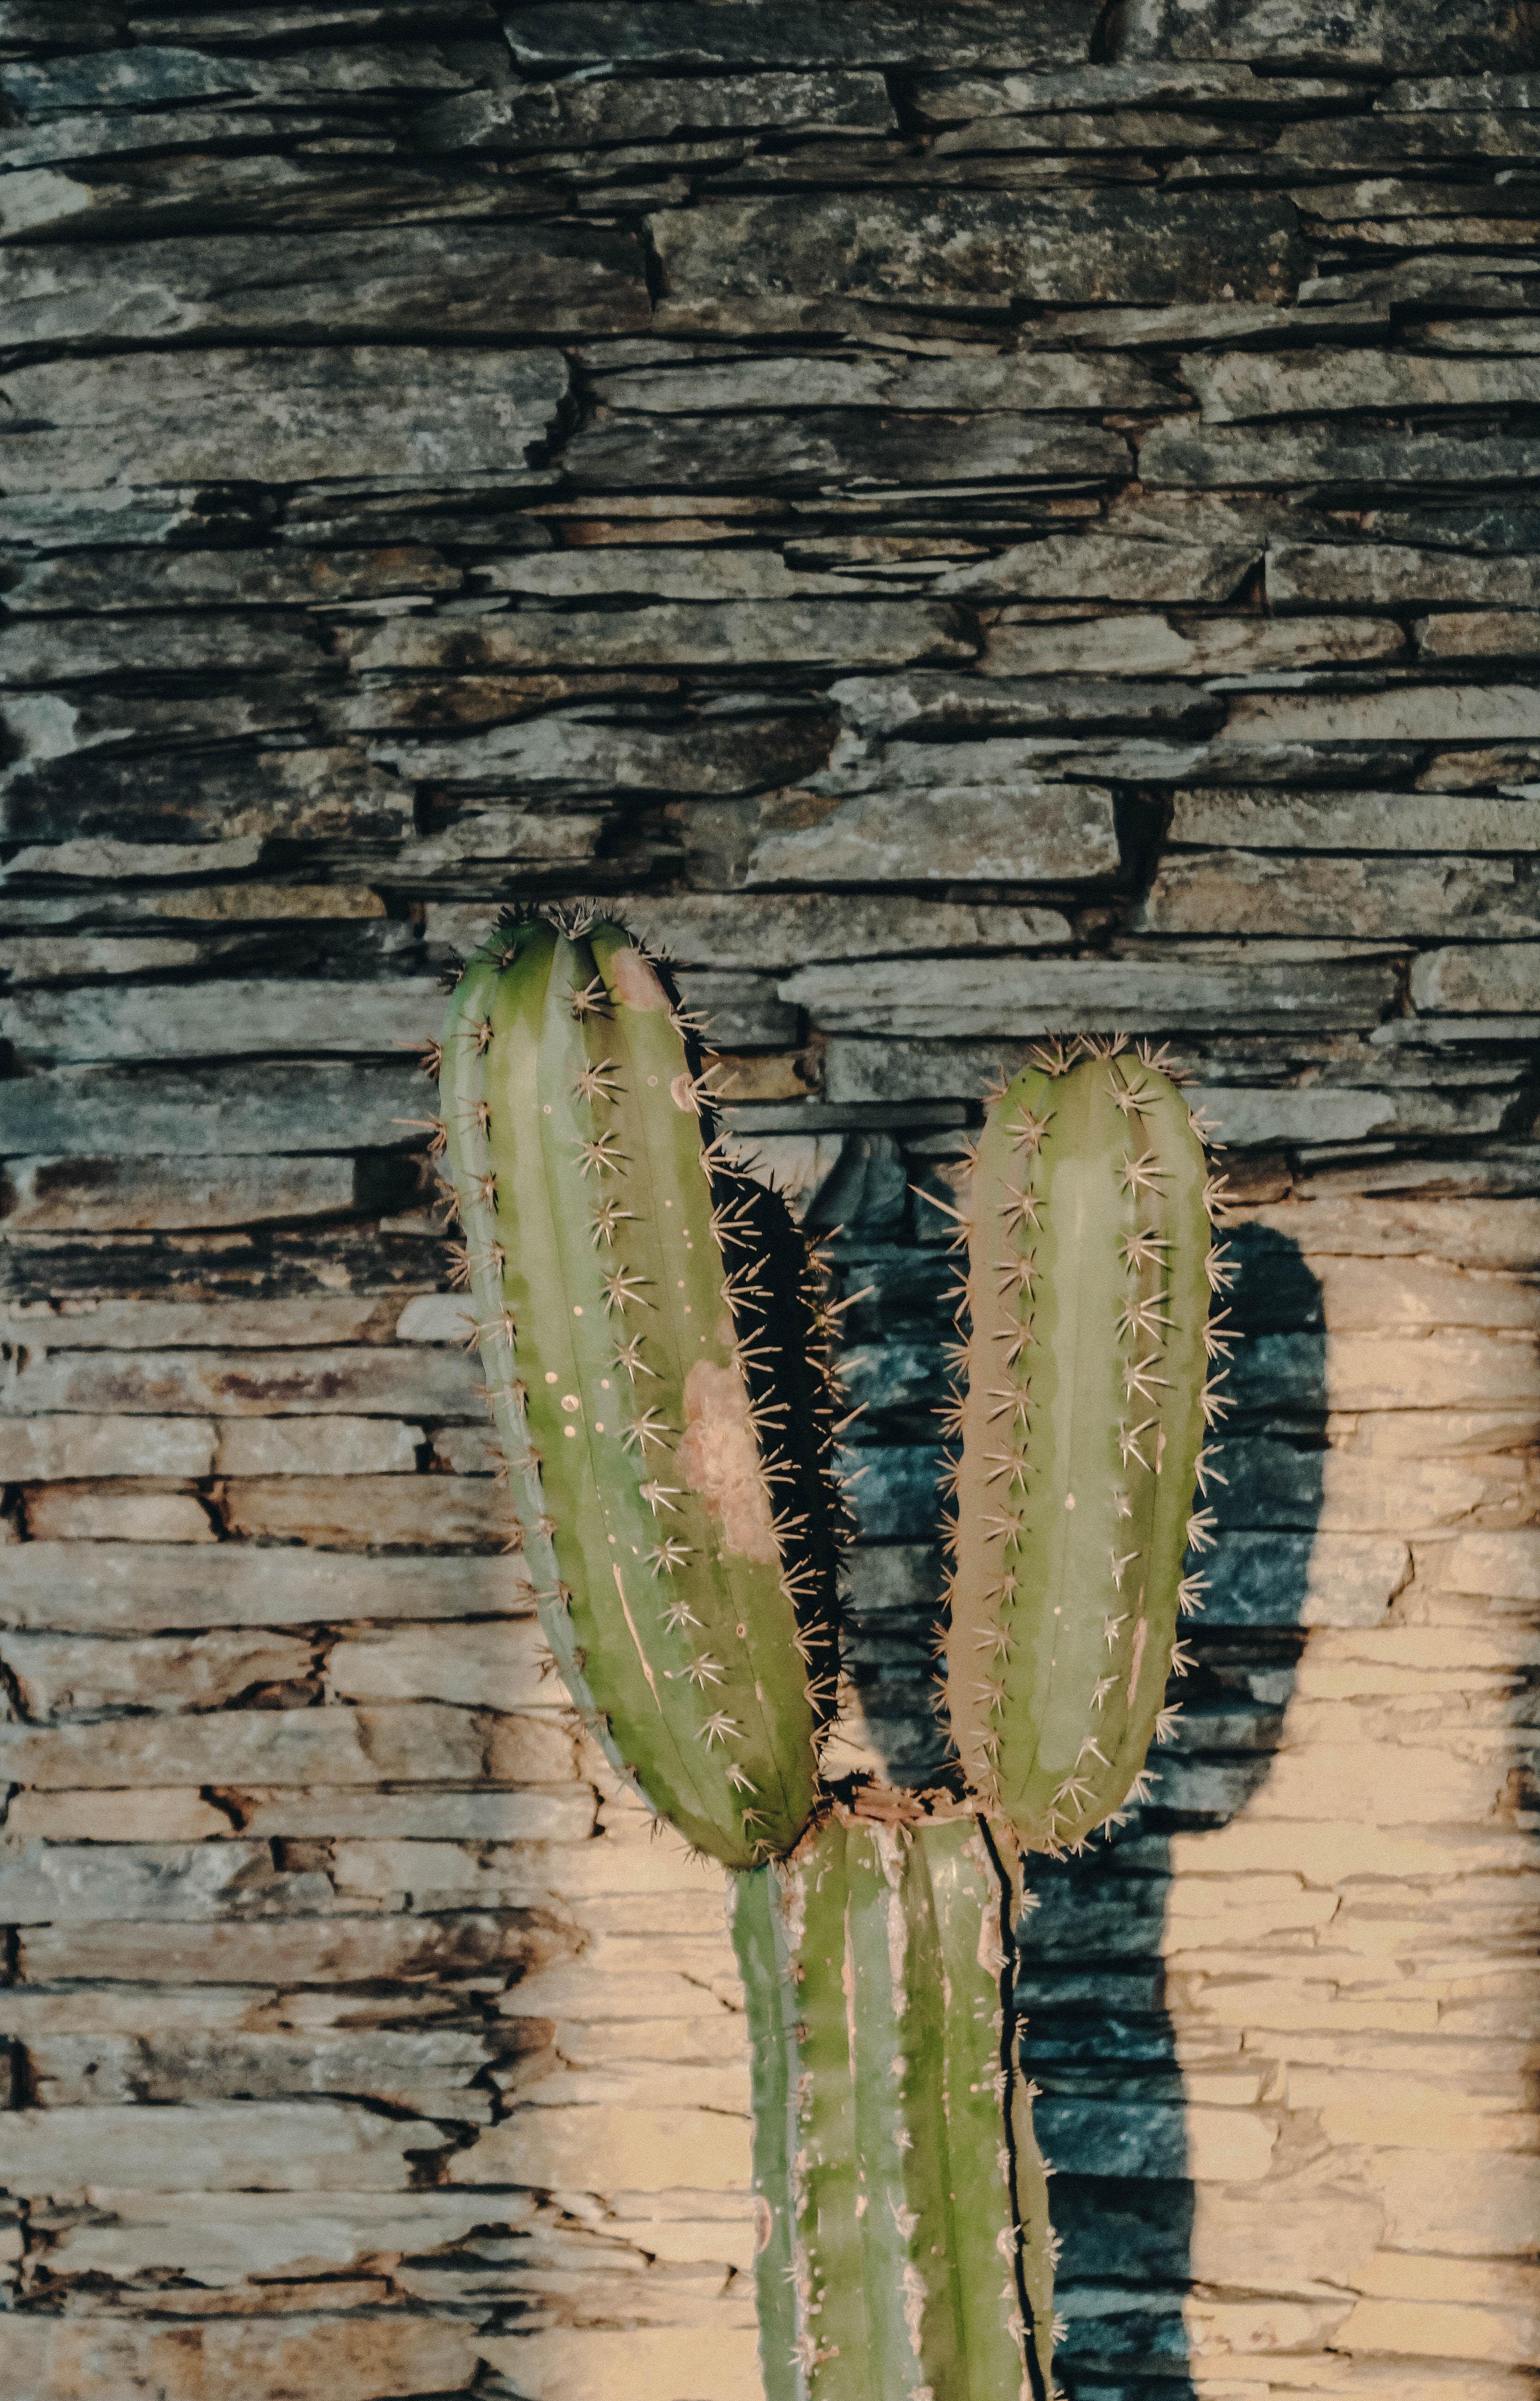 cactus plant near wall